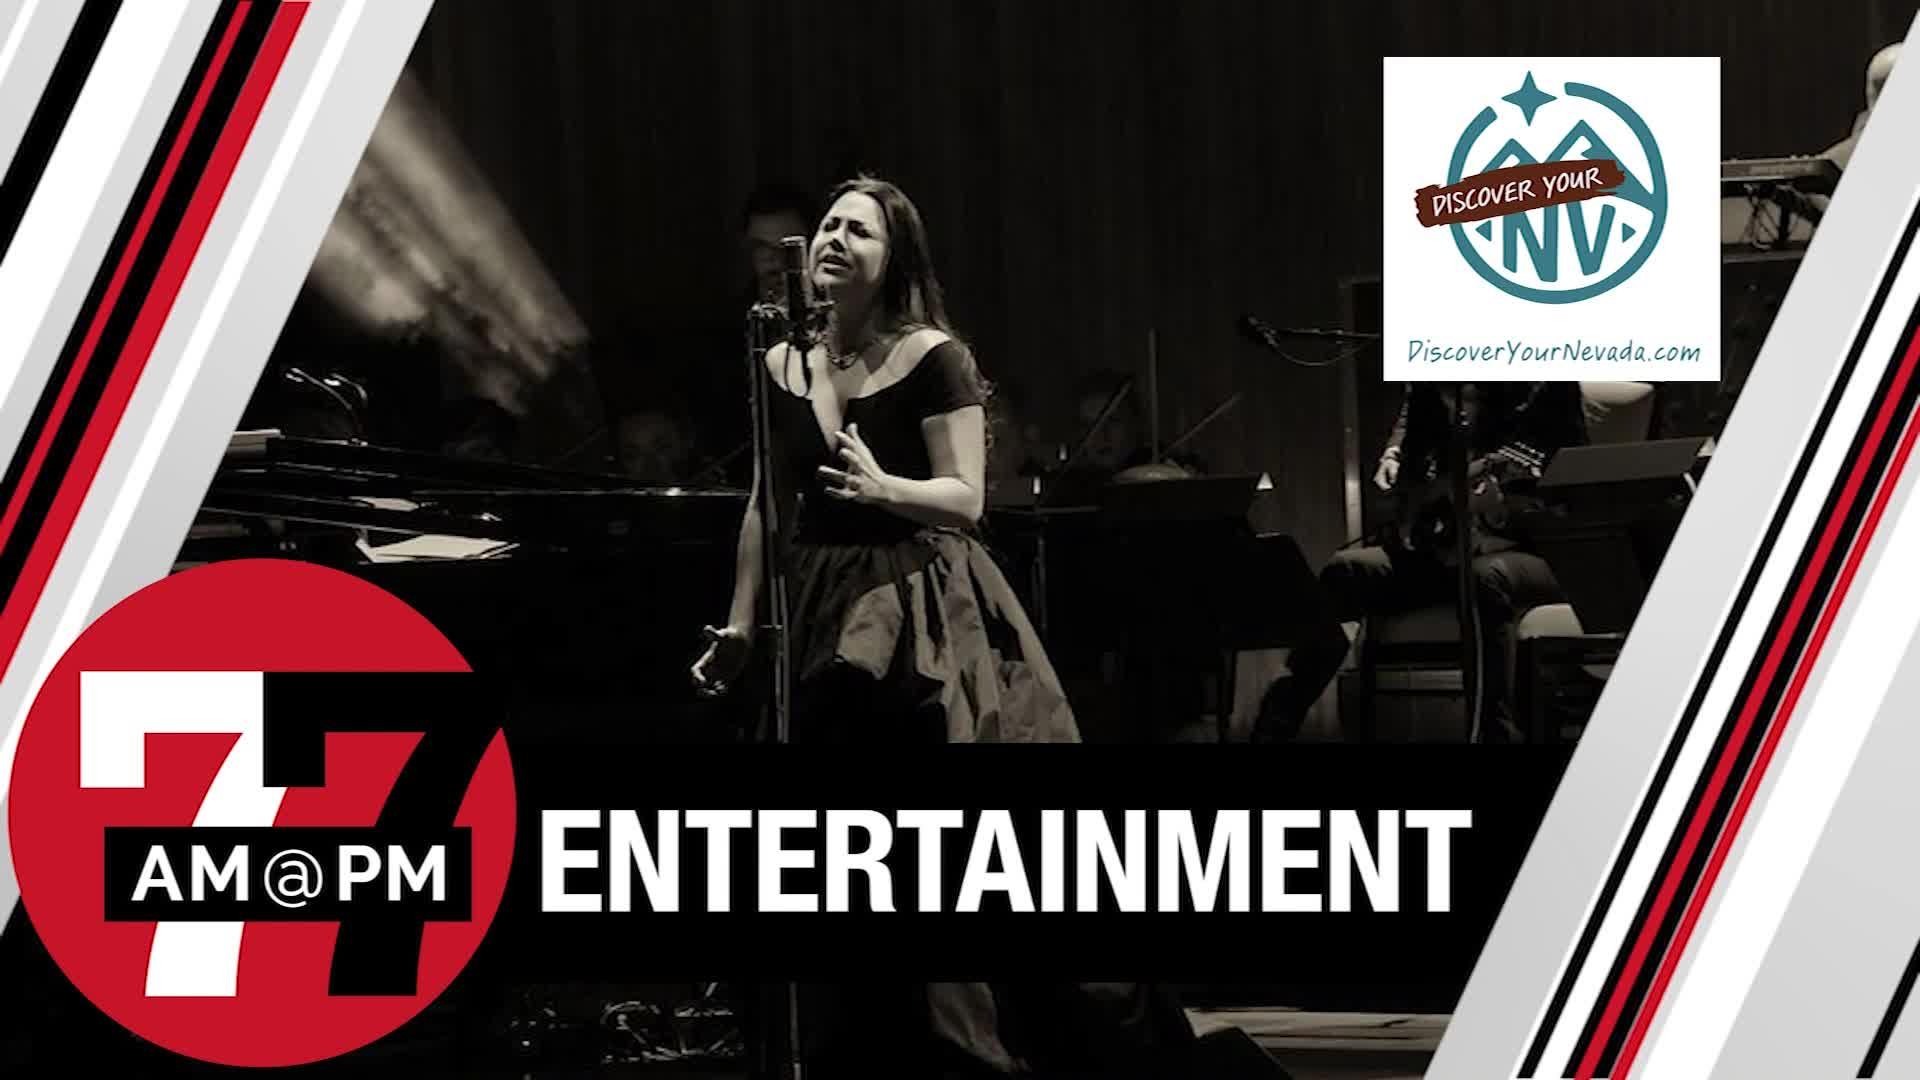 7@7PM Evanescence, Halestorm Performing